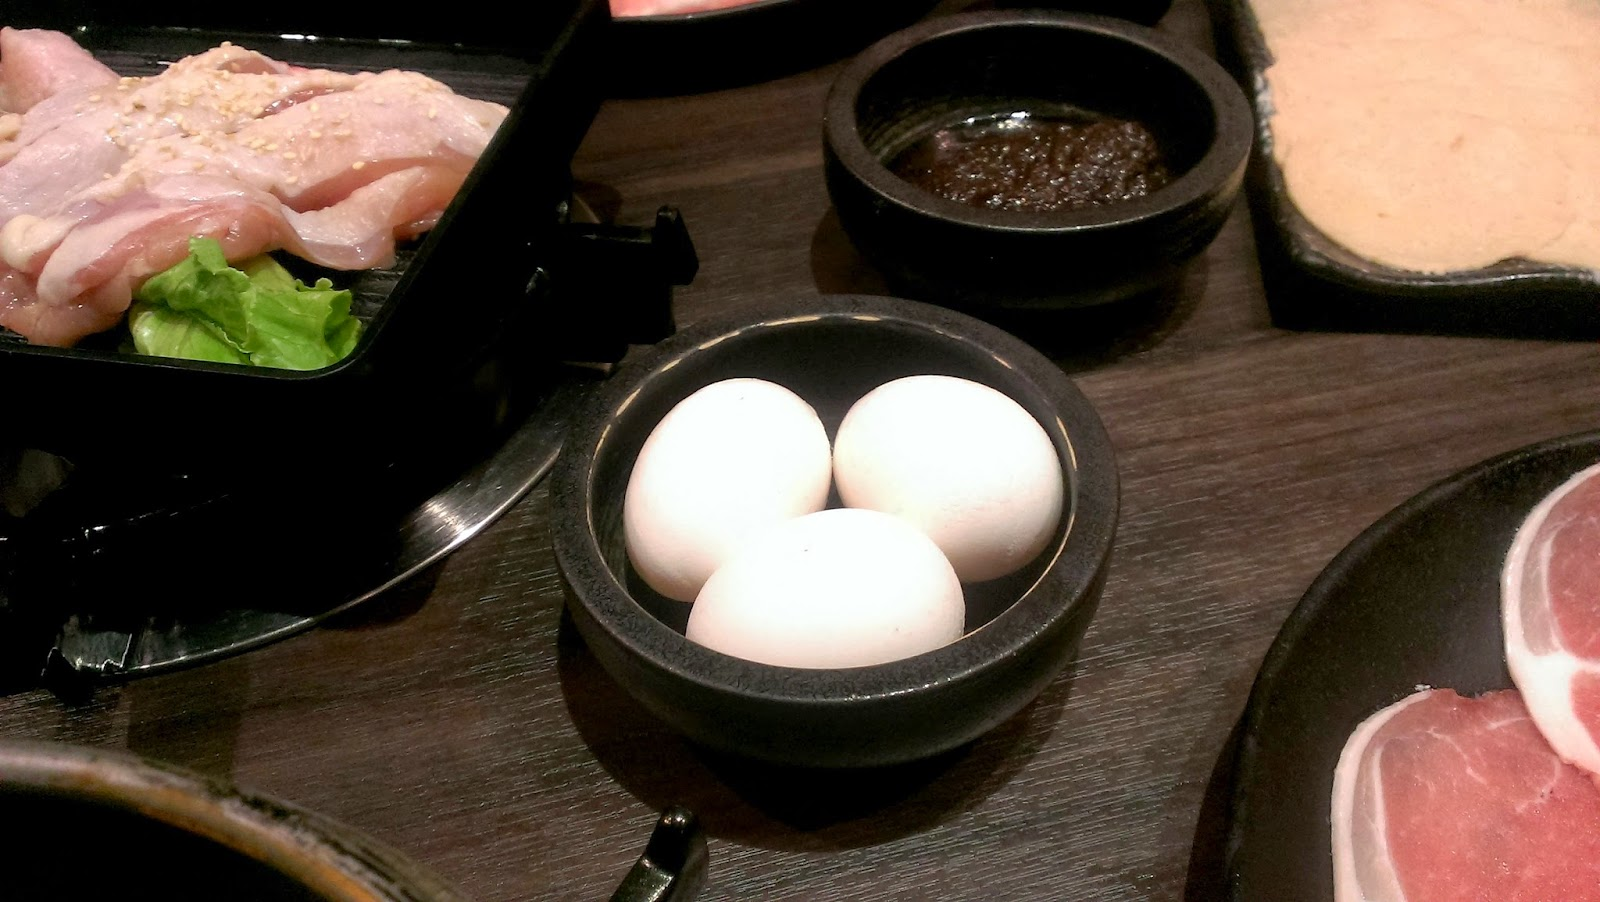 2014 08 18%2B19.18.50 - [食記] 老樣子 - 嘉義民雄火鍋店